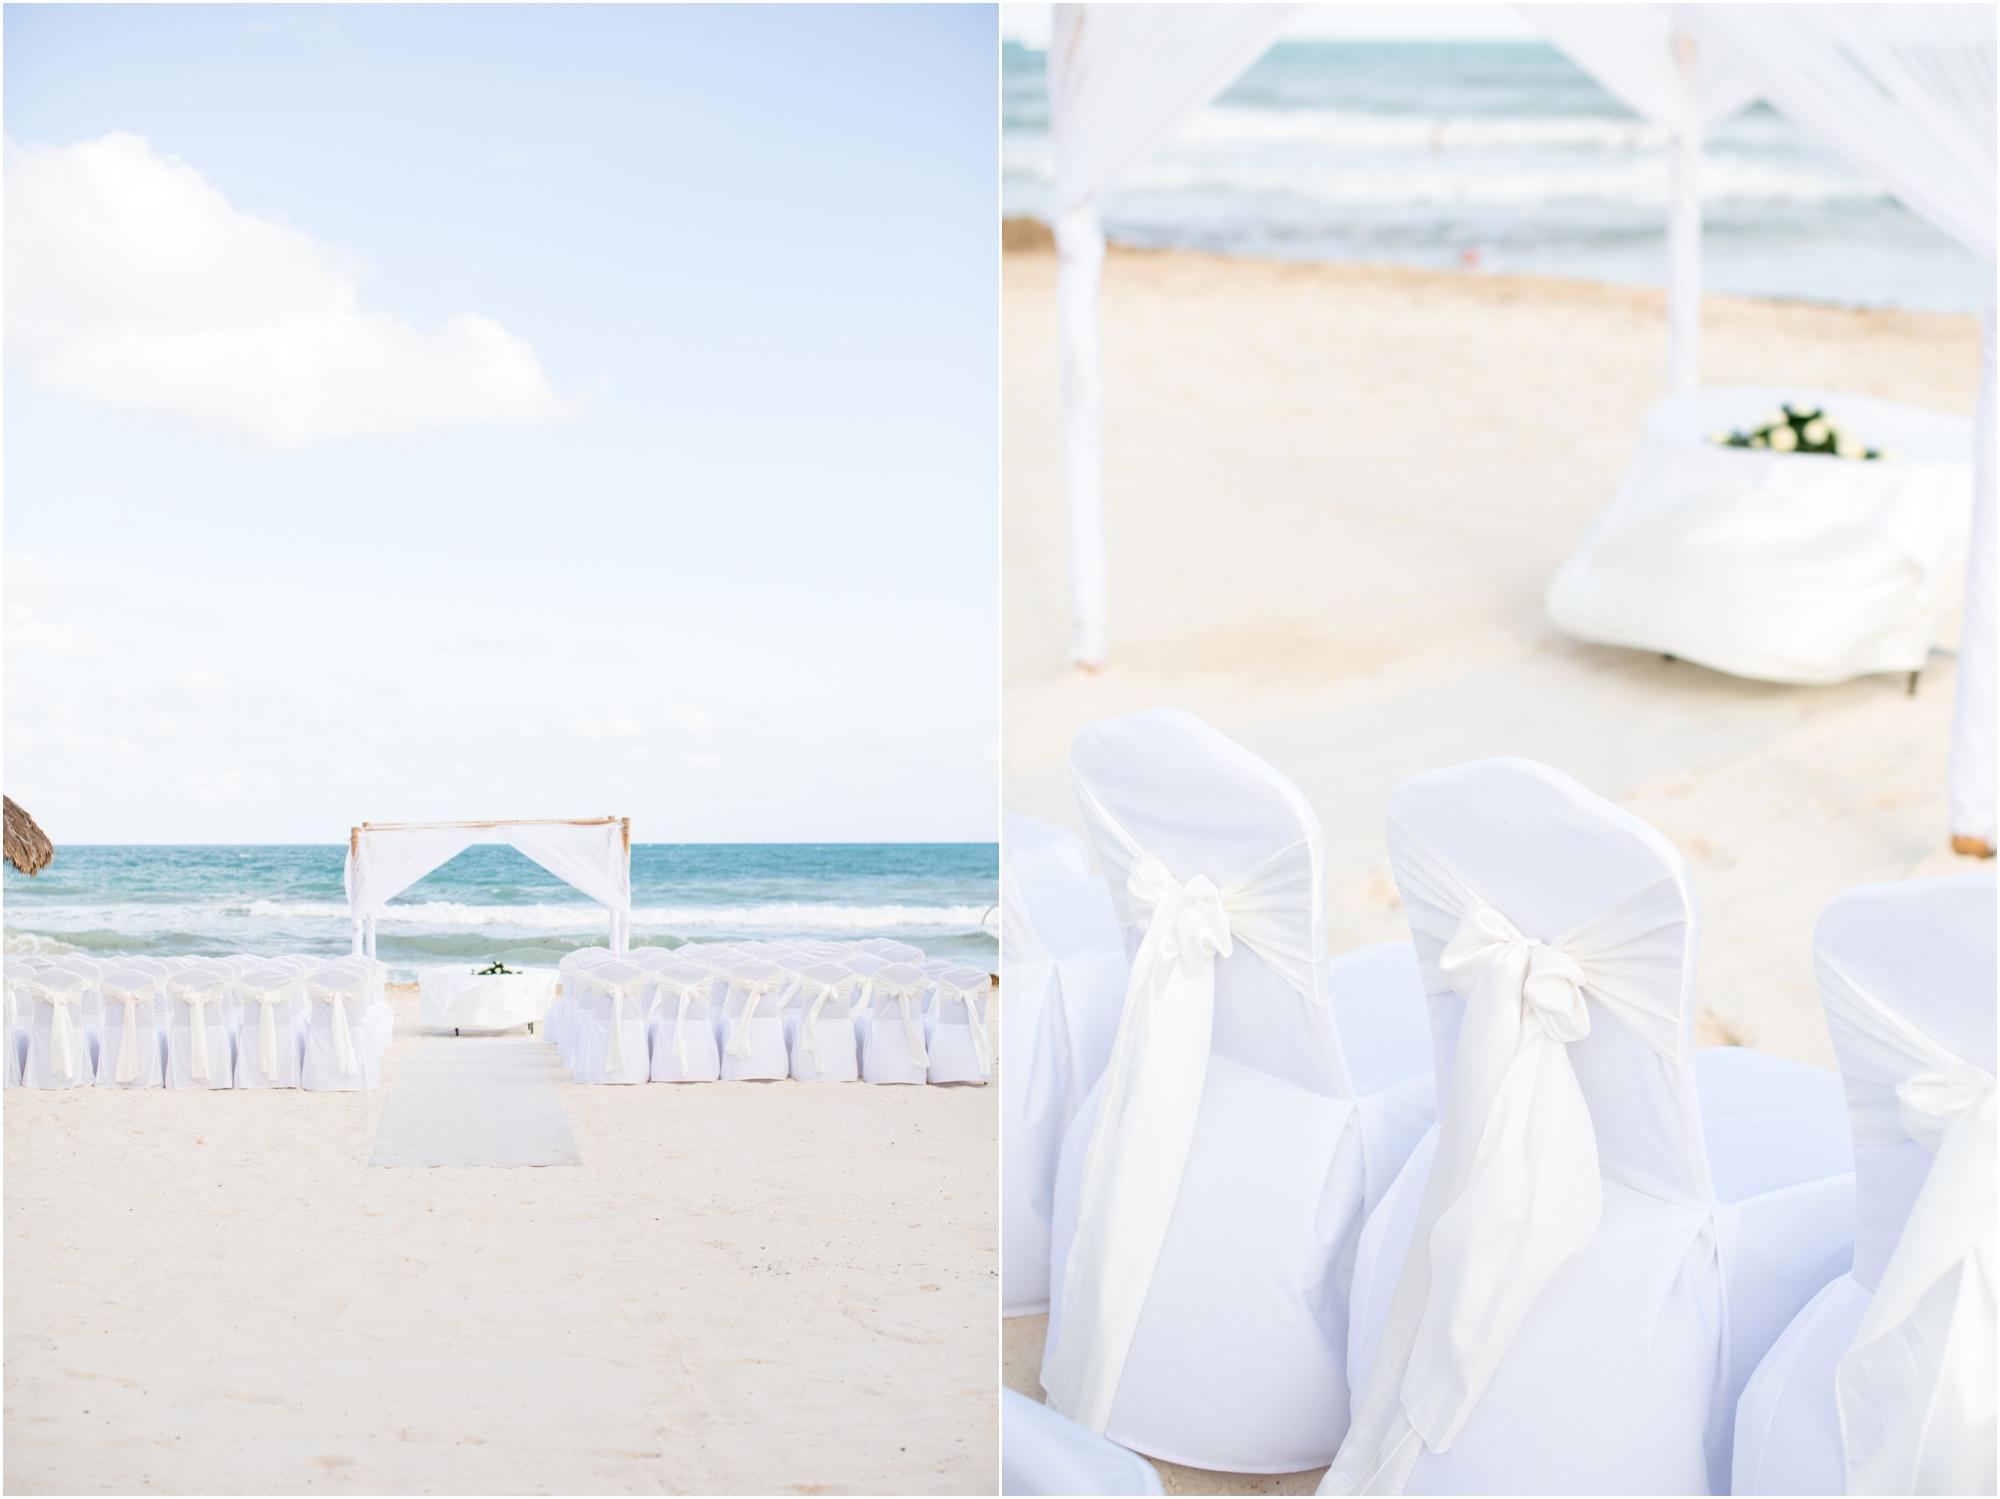 Morosoff Wedding 2-Ceremony-159_anna grace photography destination wedding photographer playa del carmen mexico photo.jpg